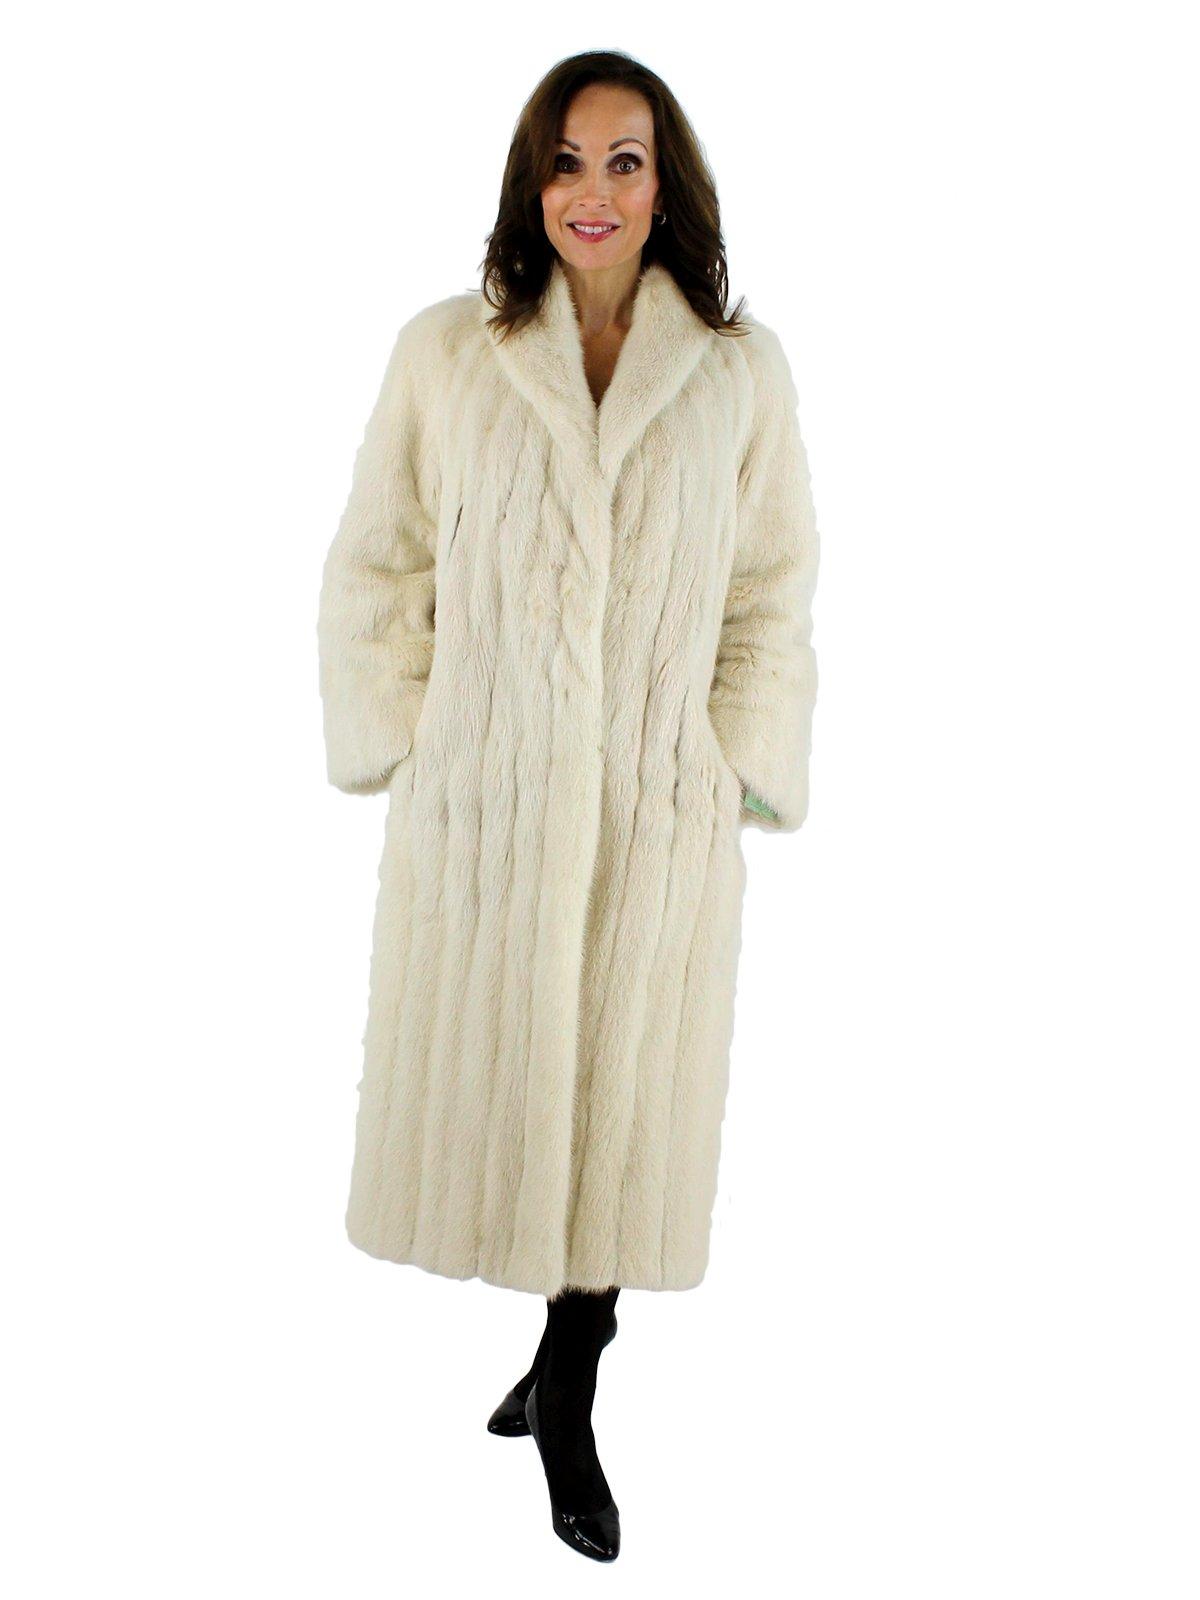 Mink Coat Value >> Tourmaline Mink Fur Coat Women S Small Estate Furs